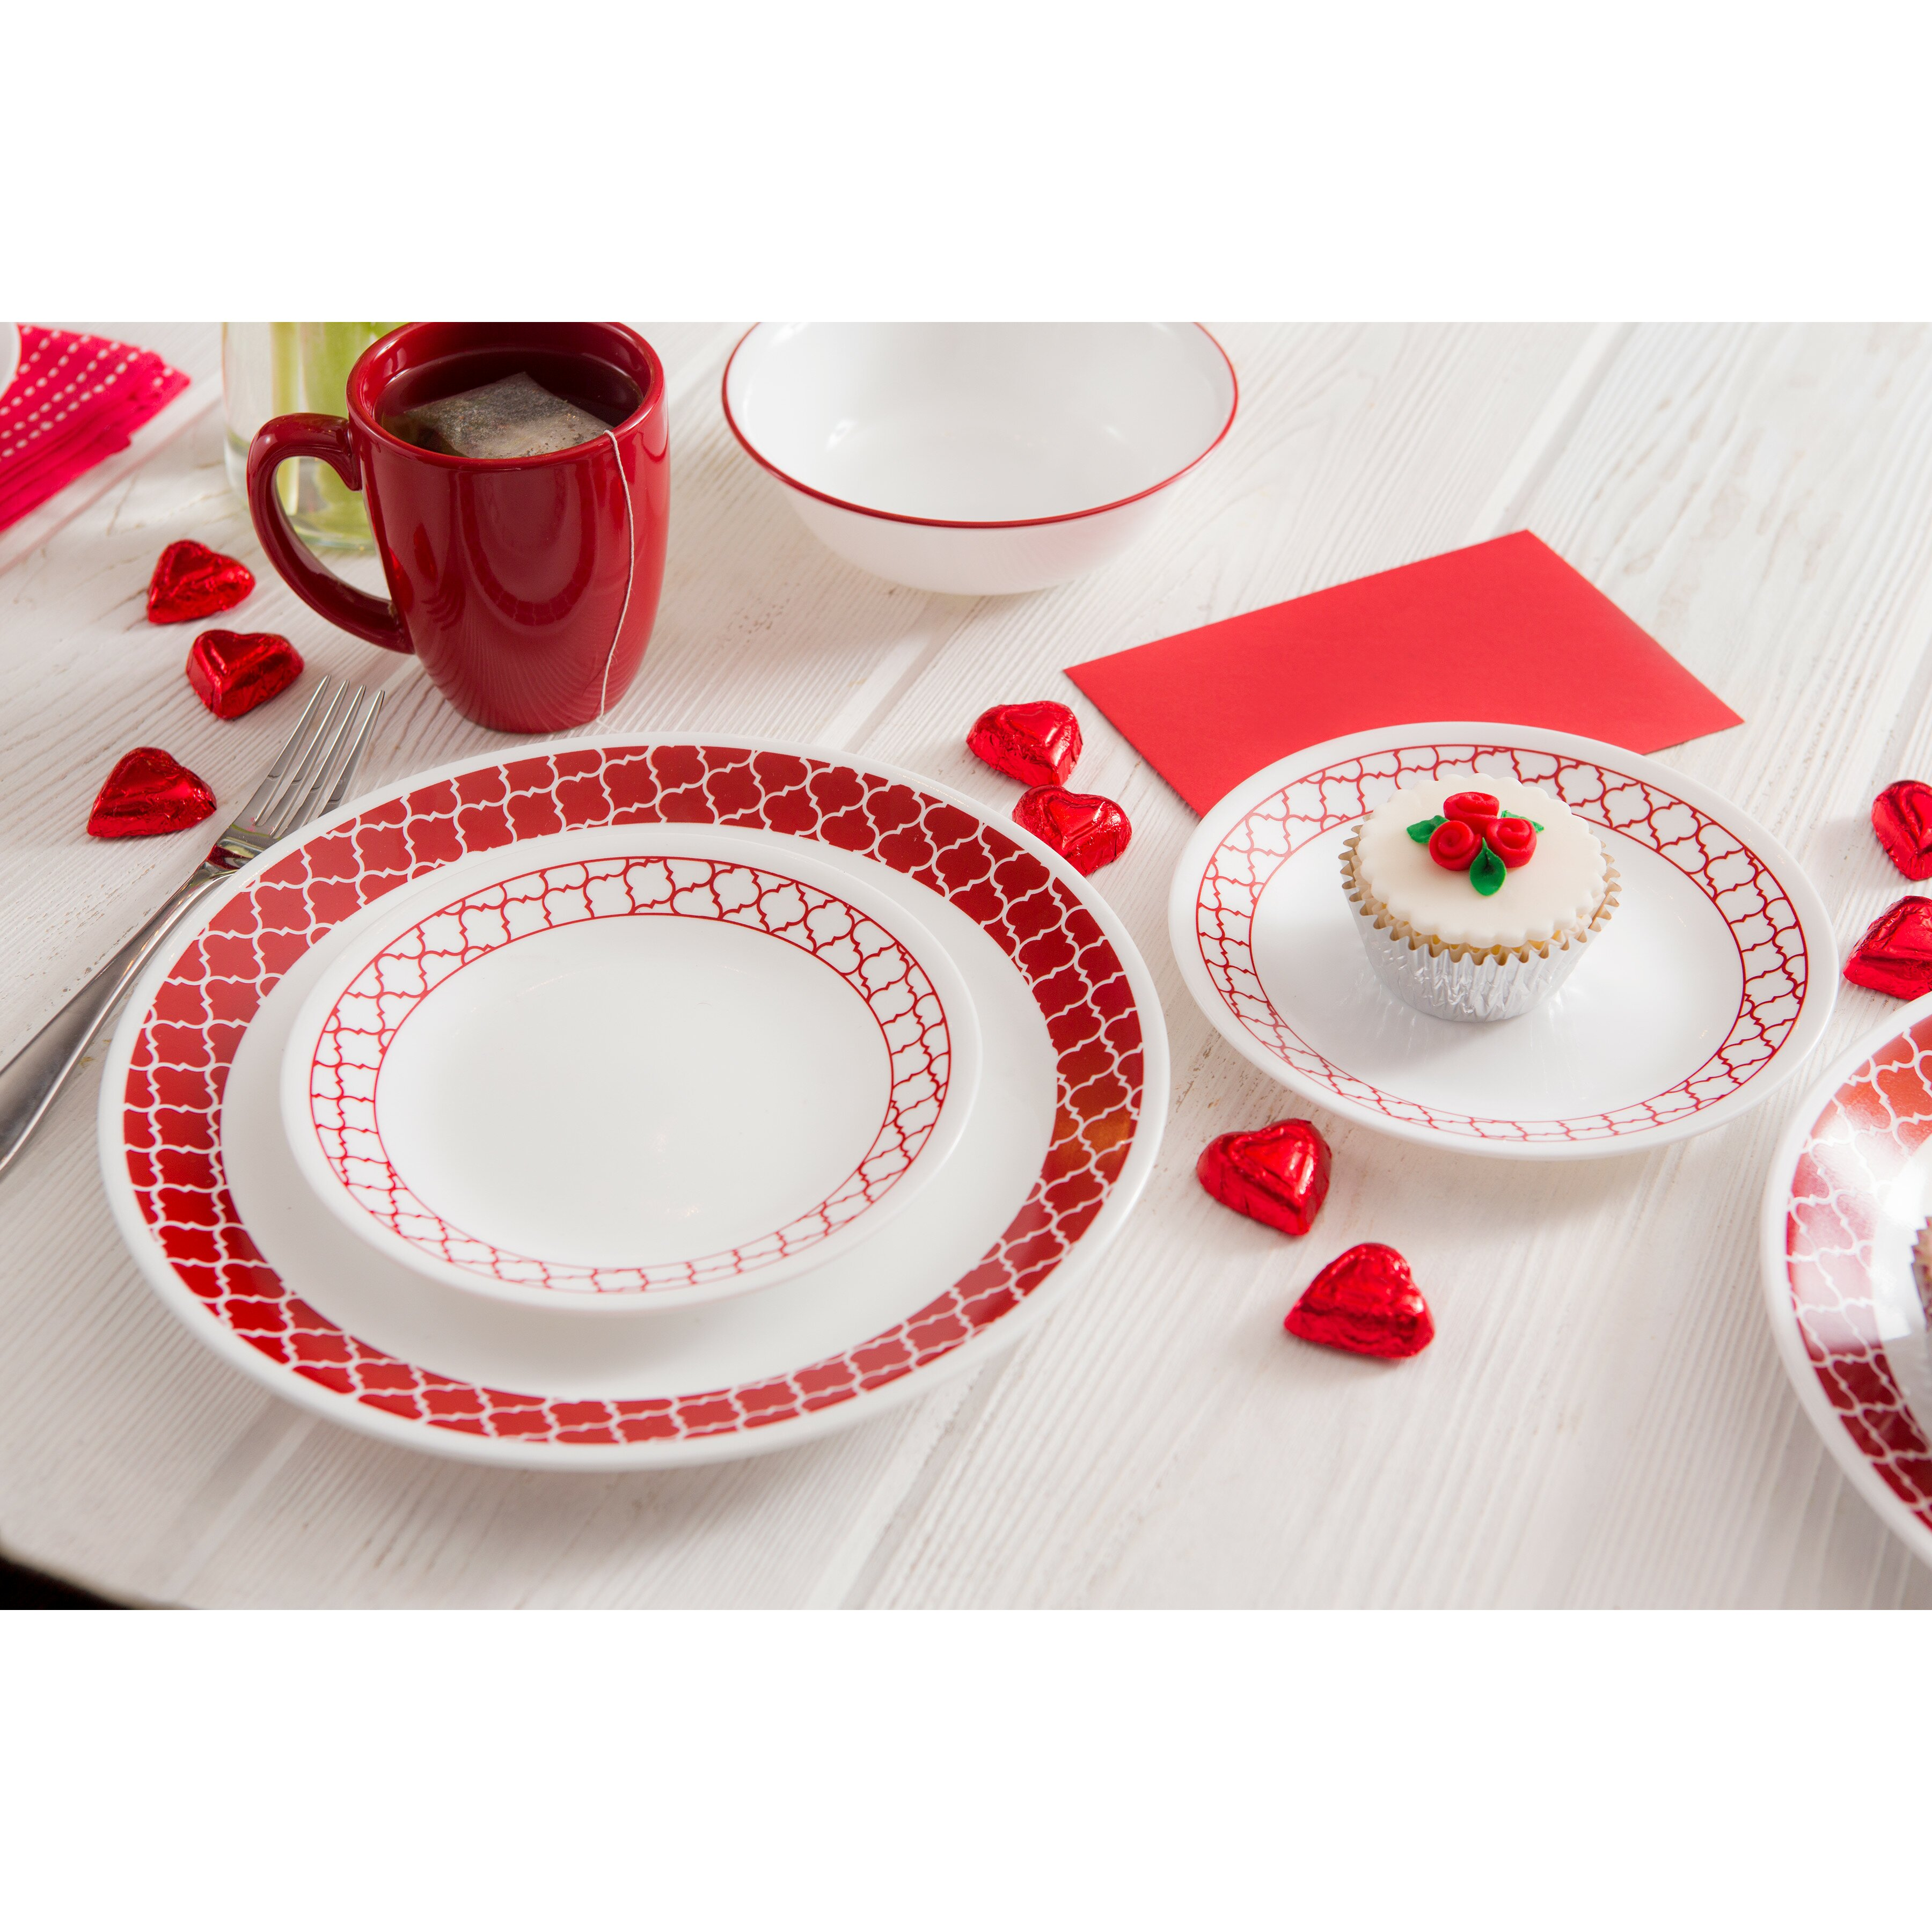 Corelle Livingware Crimson Trellis 16 Piece Dinnerware Set Reviews Wa